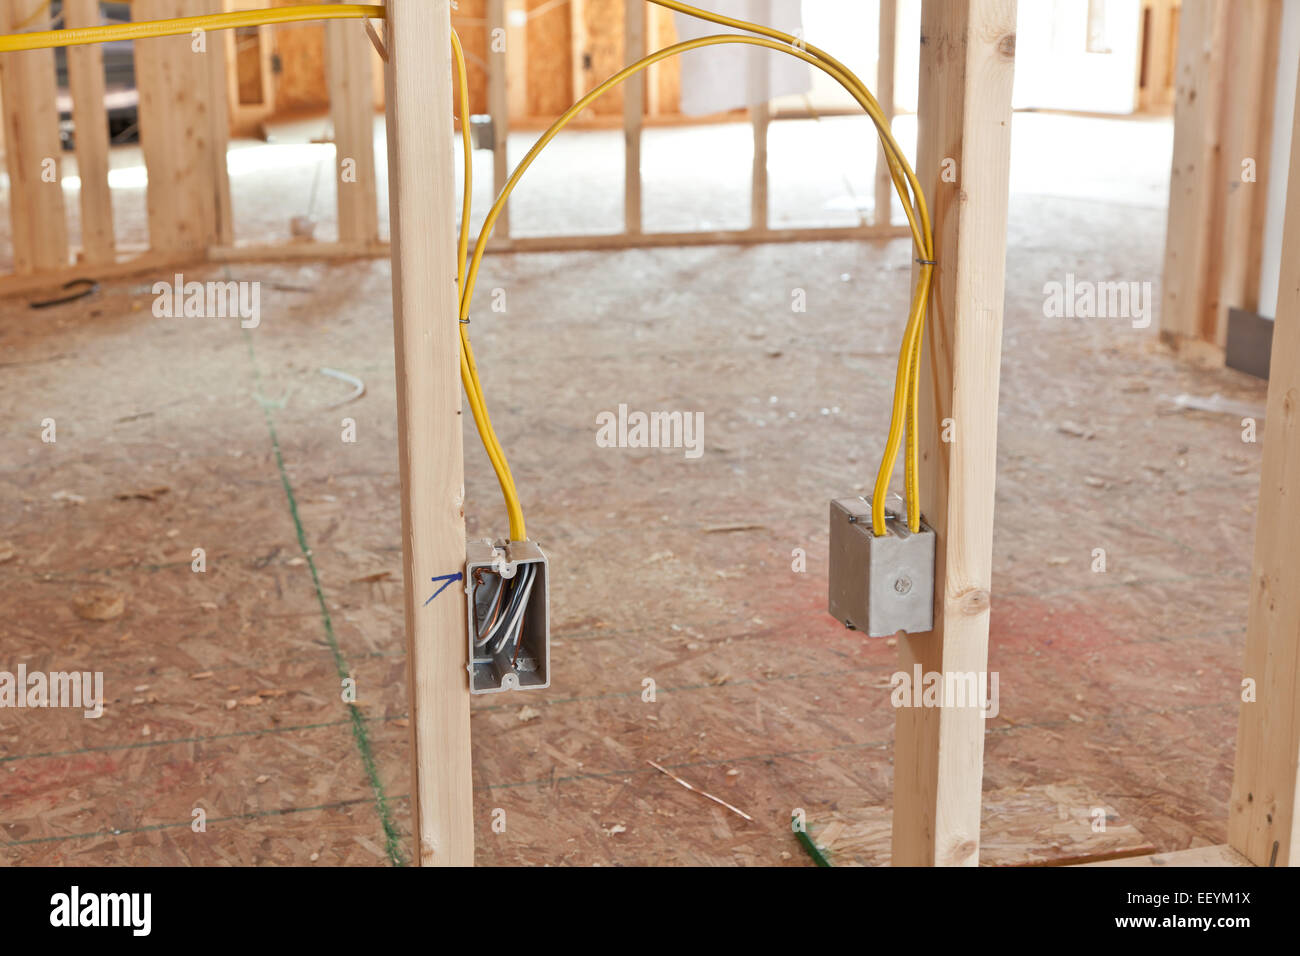 elektroinstallation im haus neubau stockfoto bild 78055094 alamy. Black Bedroom Furniture Sets. Home Design Ideas